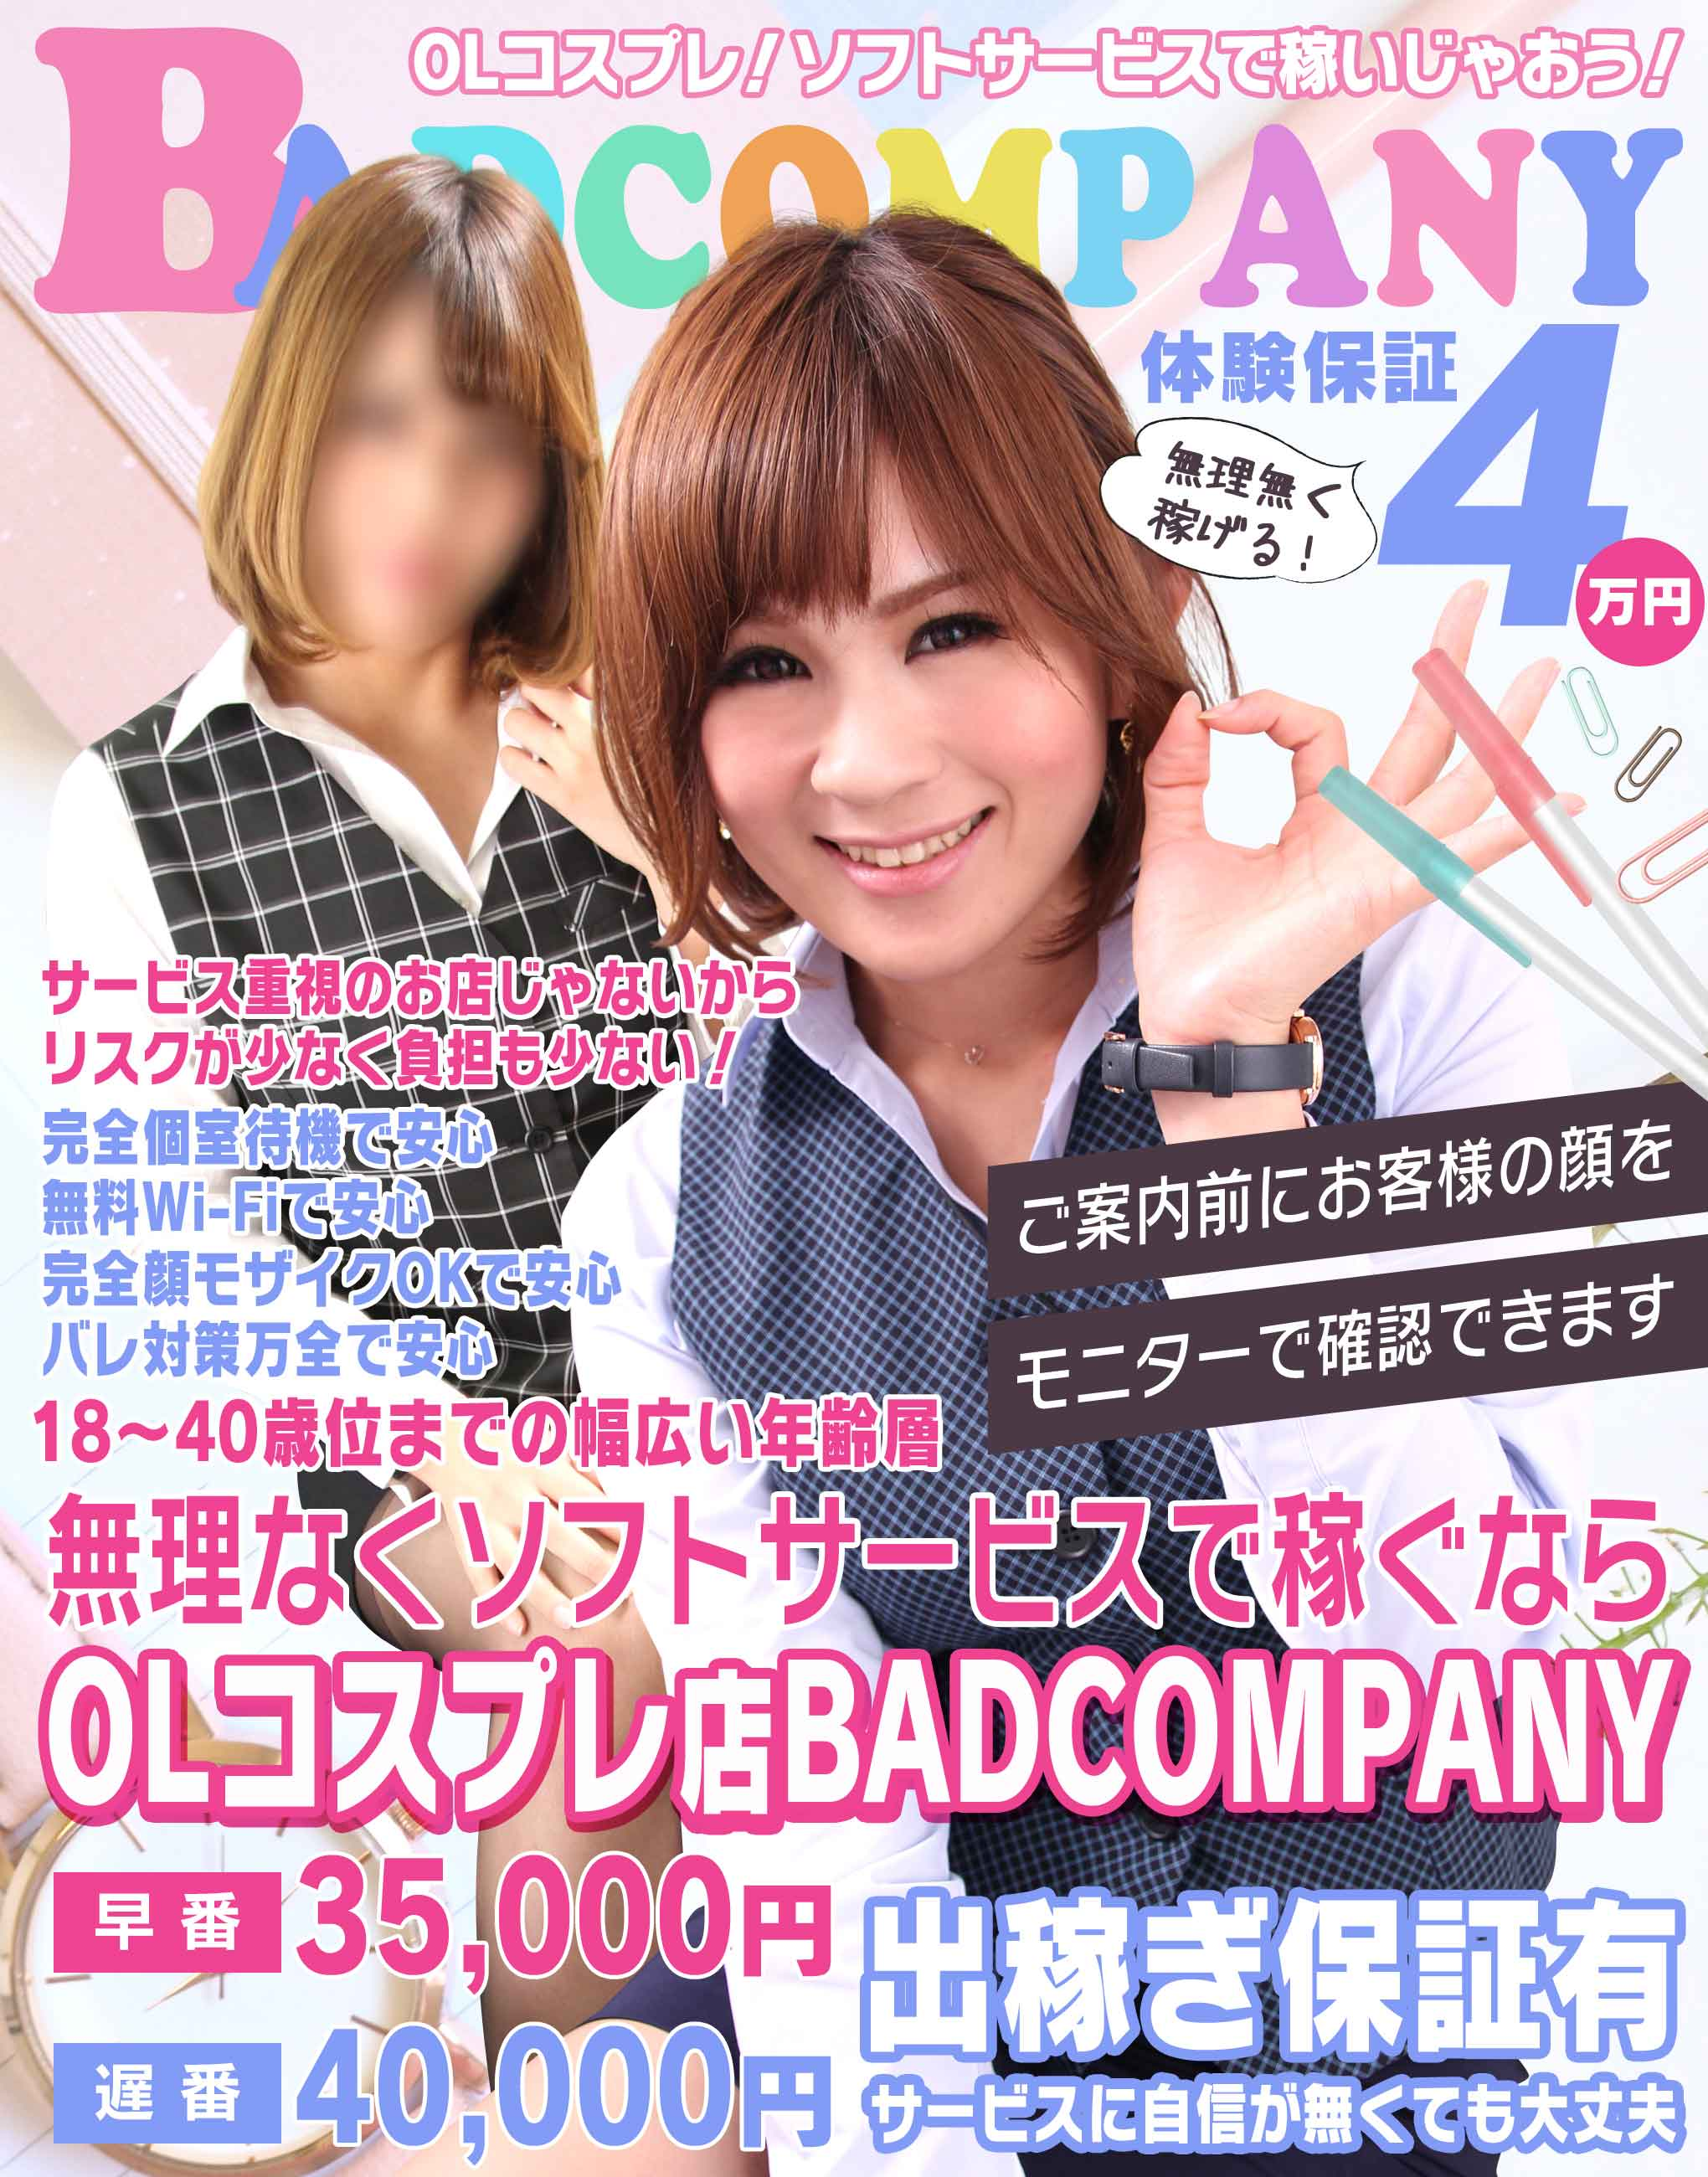 BADCOMPANY水戸店 YESグループ - 水戸